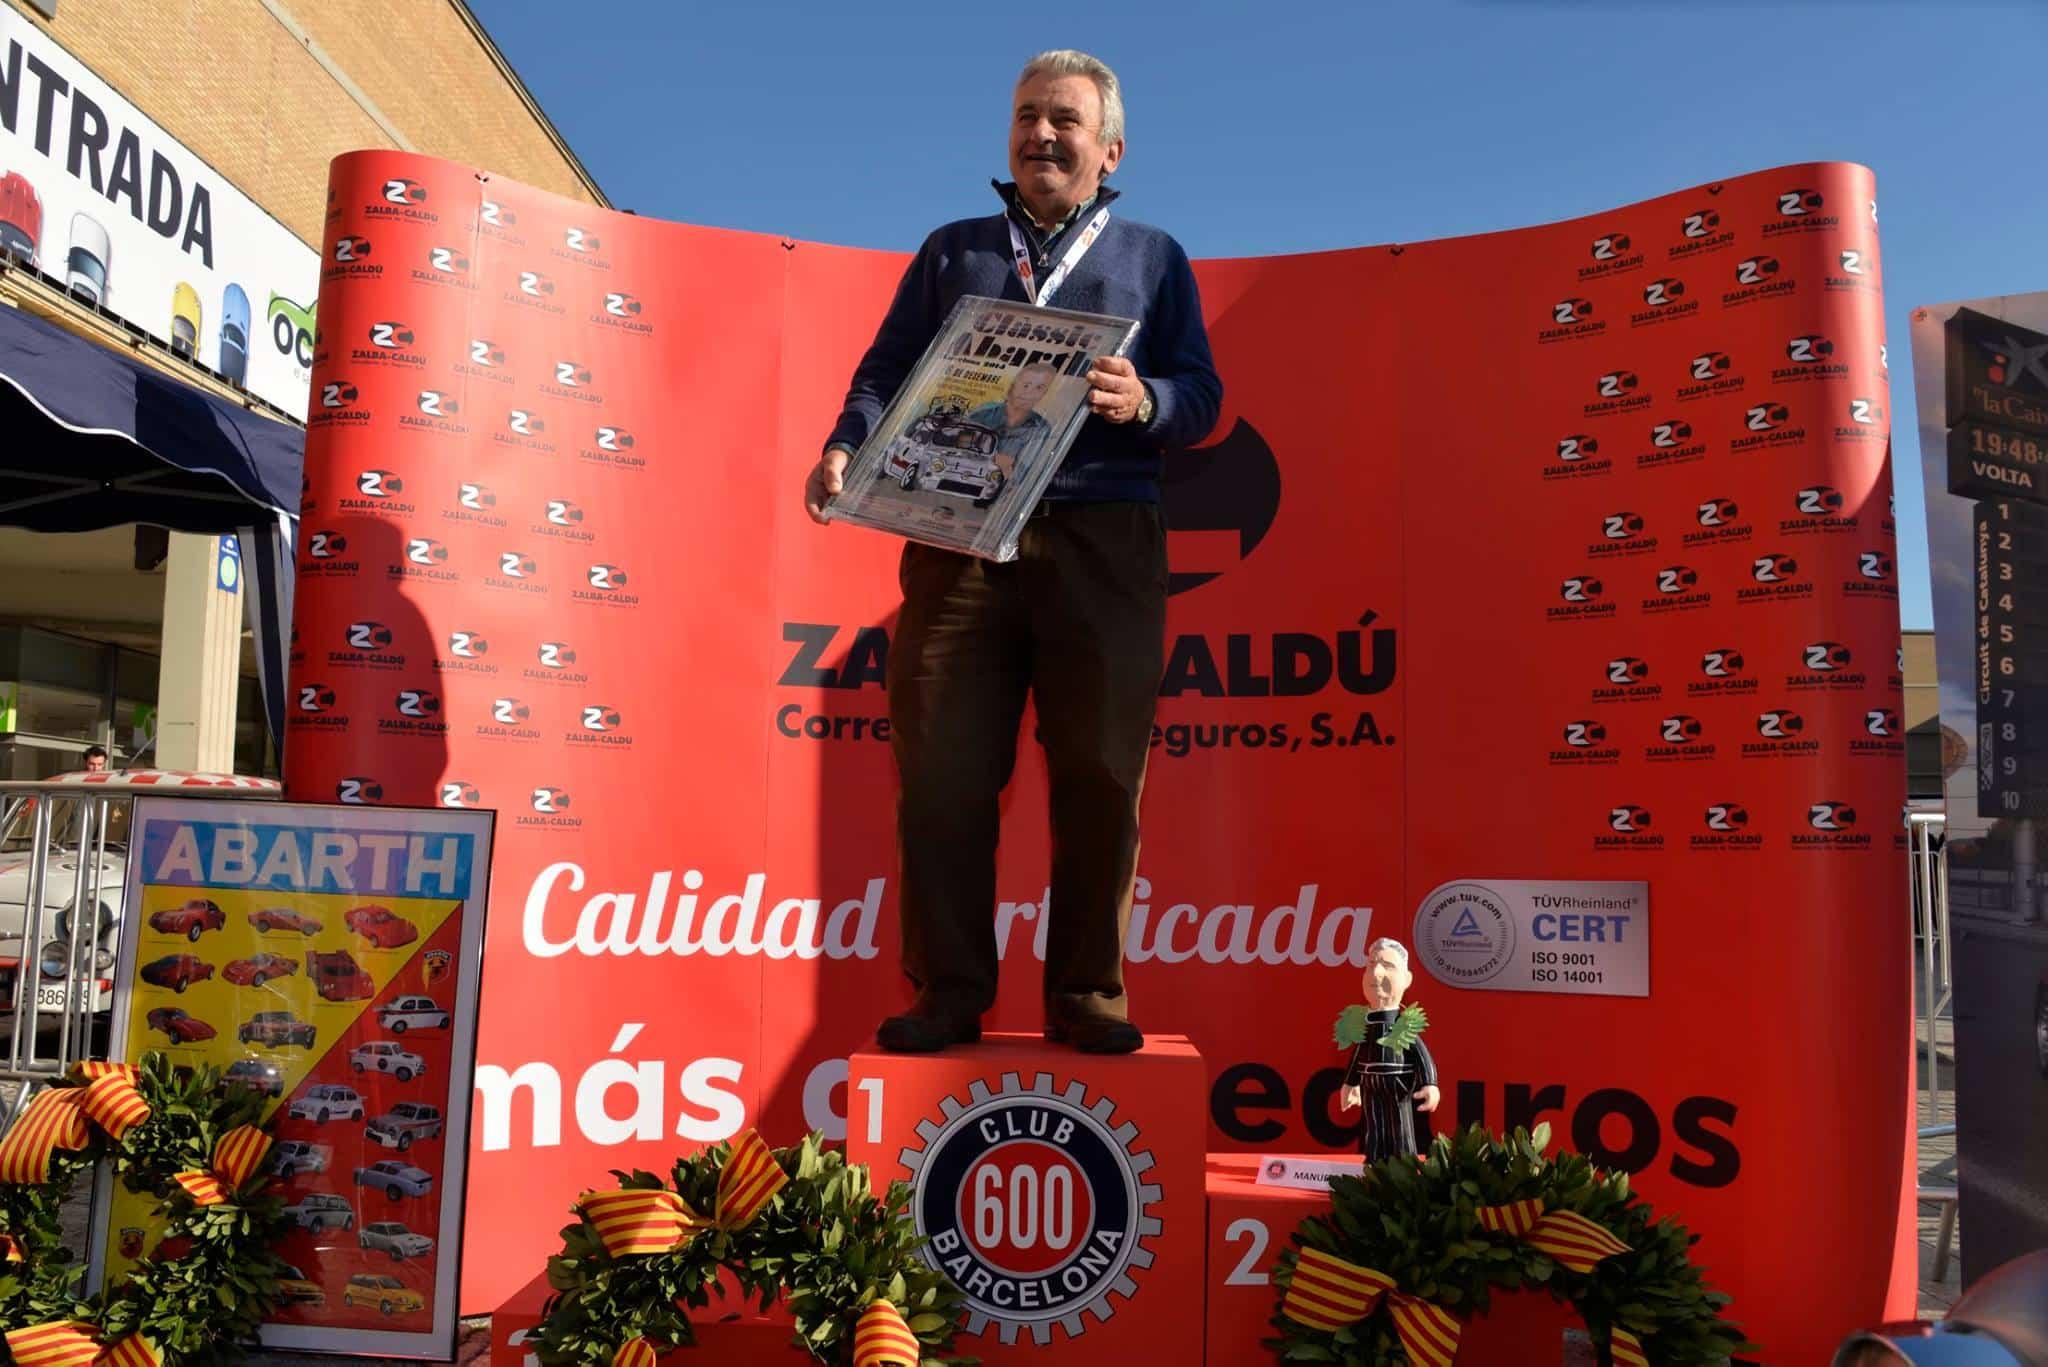 Club 600 Barcelona Zalba-Caldú